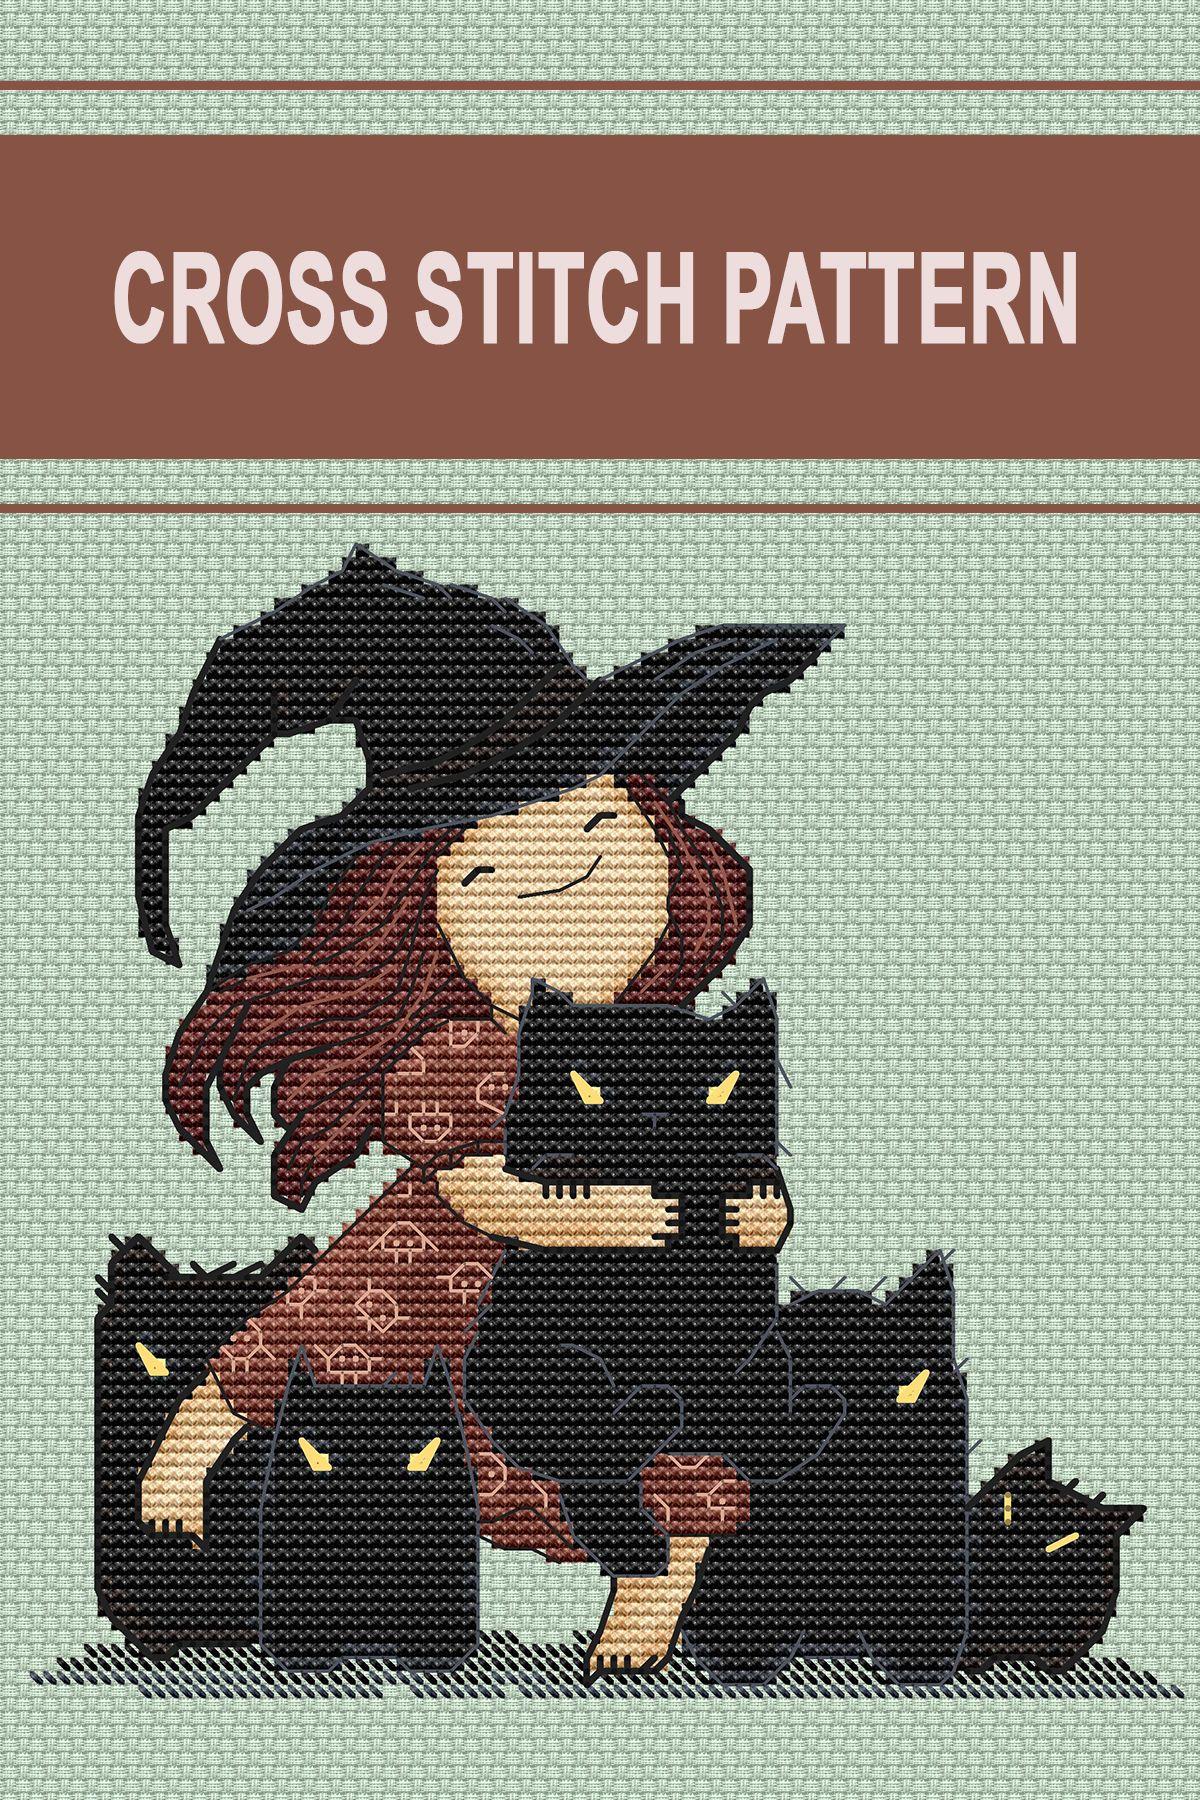 Cat cross stitch pattern by ILikeCrossStitch. Black angry cat cross stitch patterns